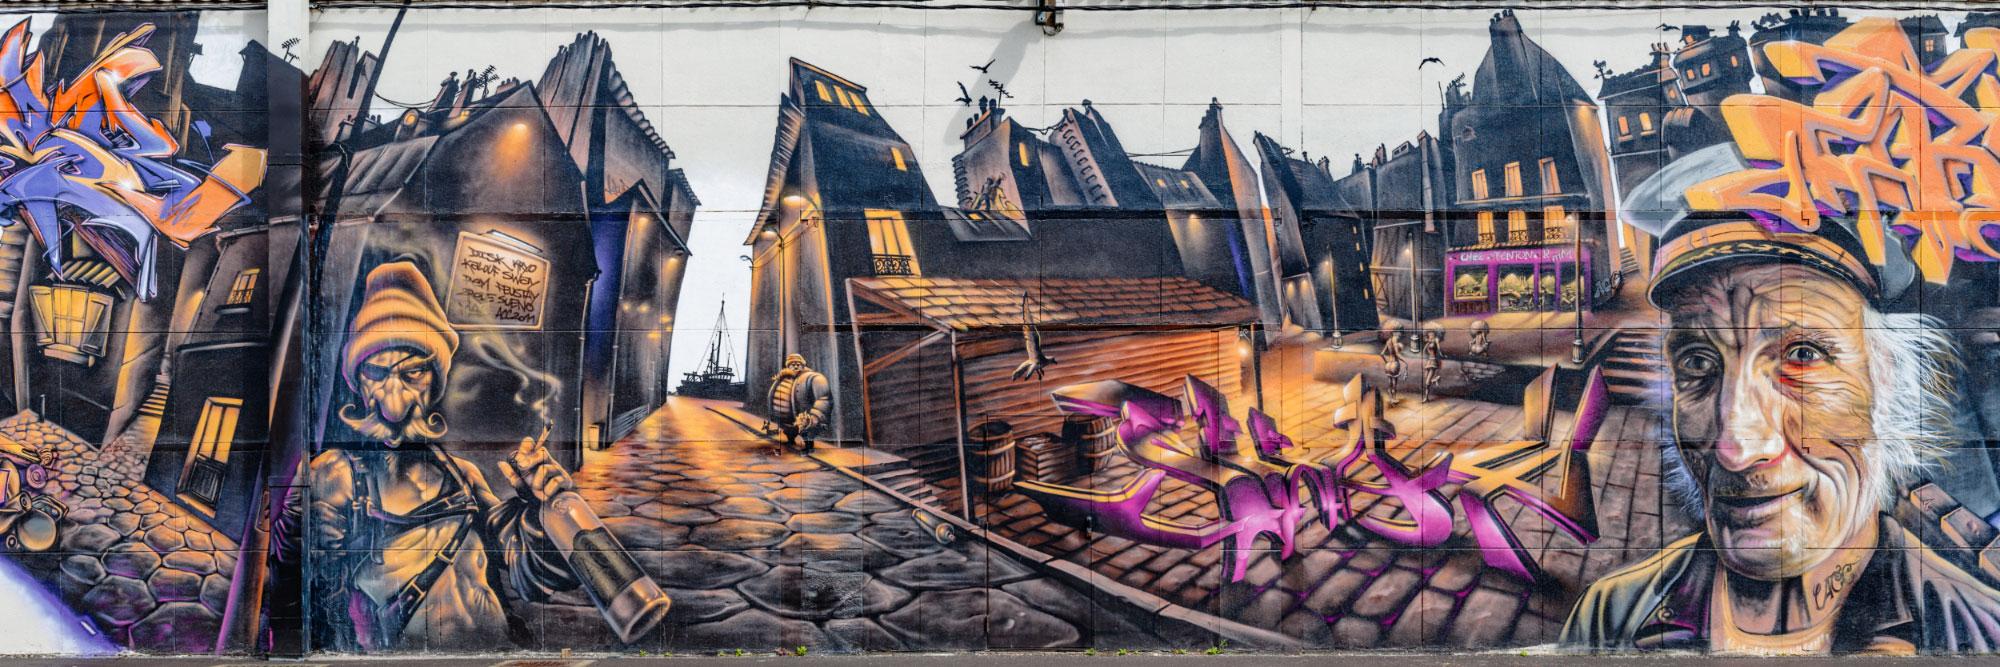 Graff, Hangar 181, avenue du Grand Cours, Rouen / Acc Crew